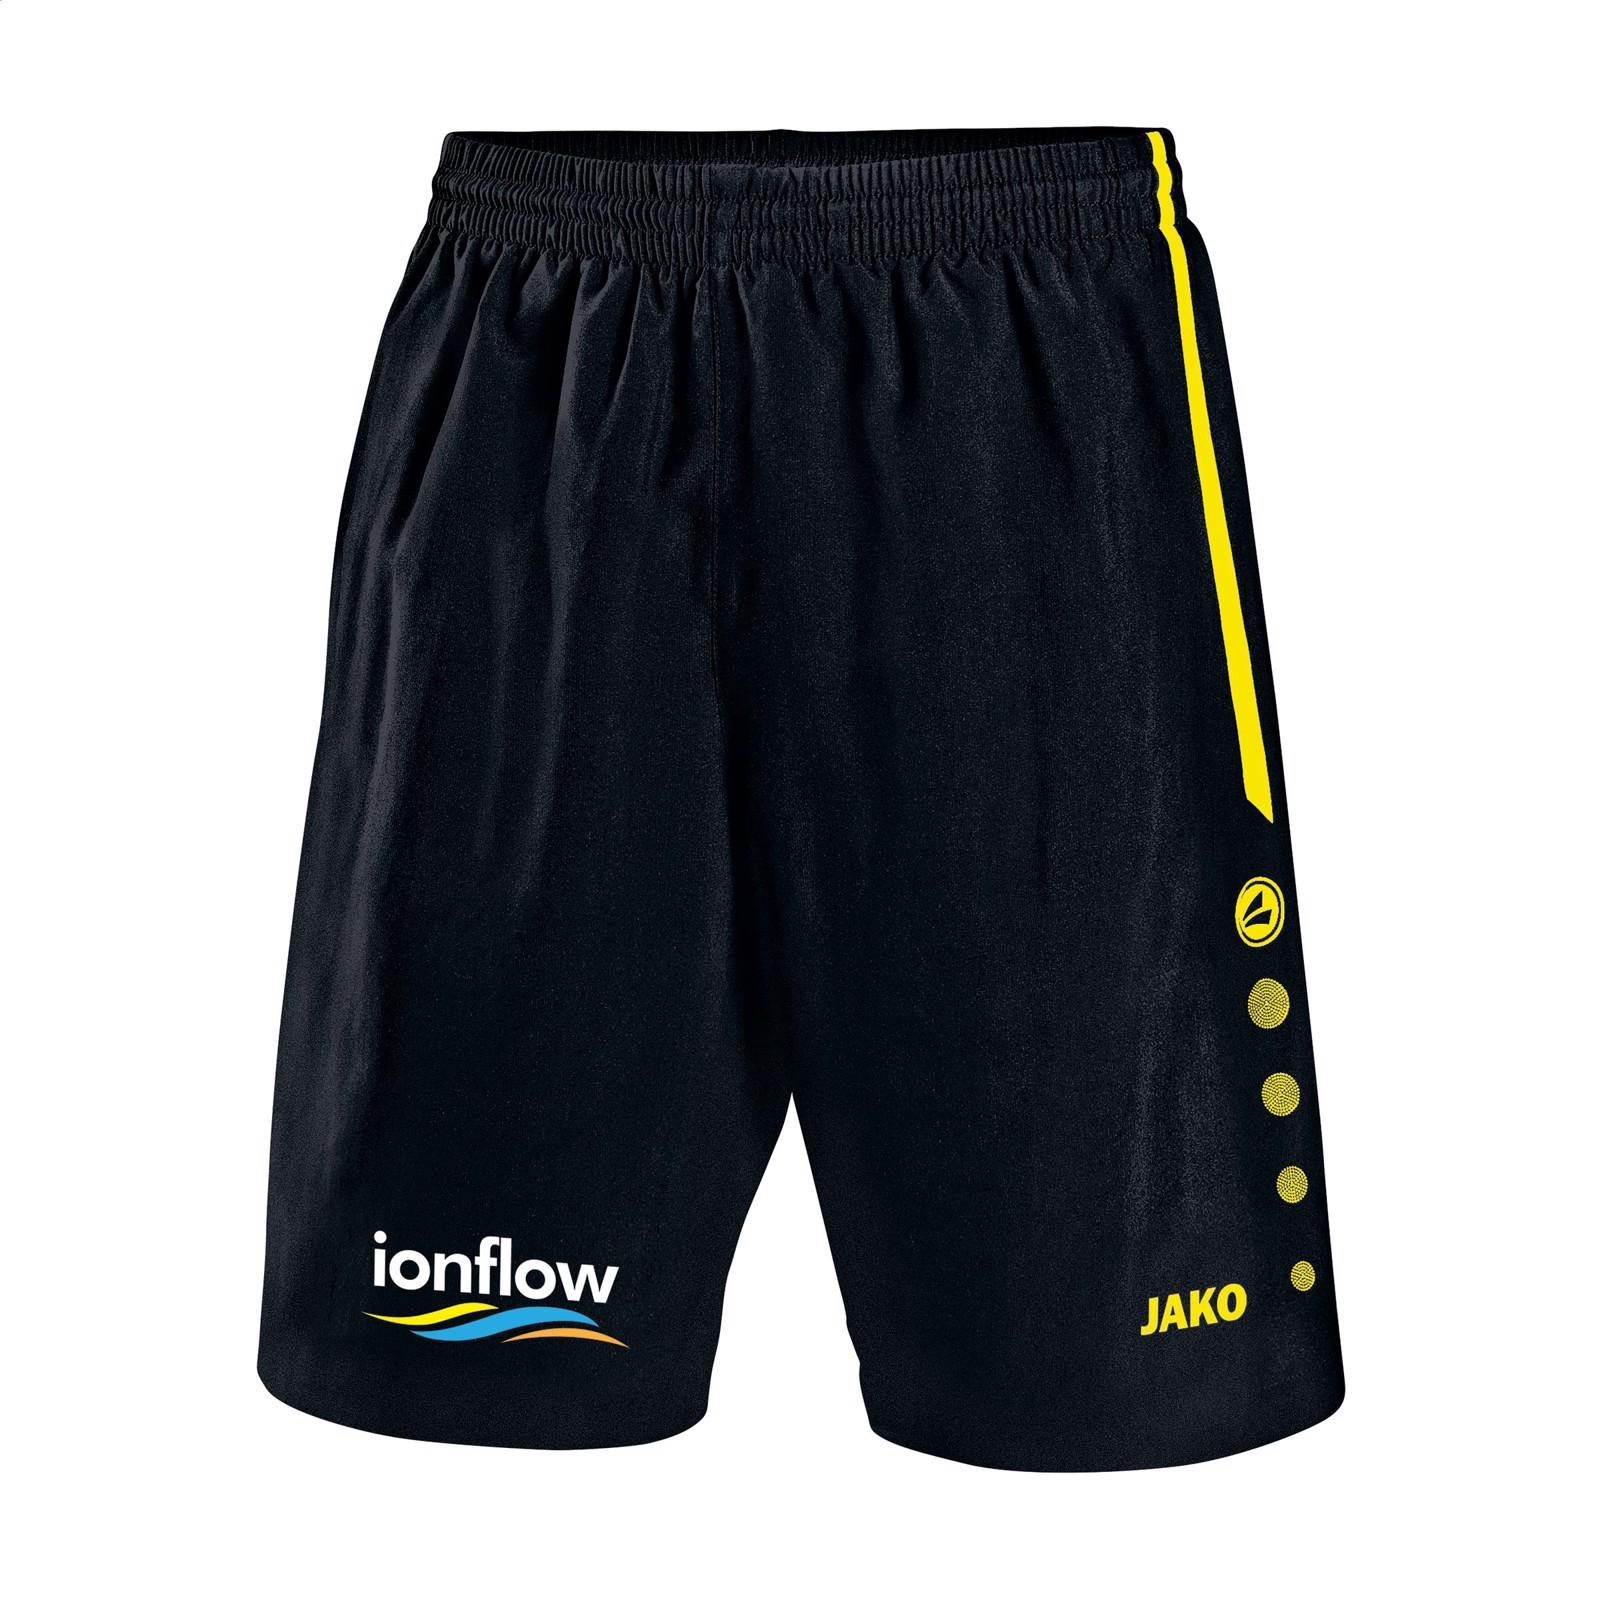 Jako® Shorts Turin mens - Black / Yellow / M